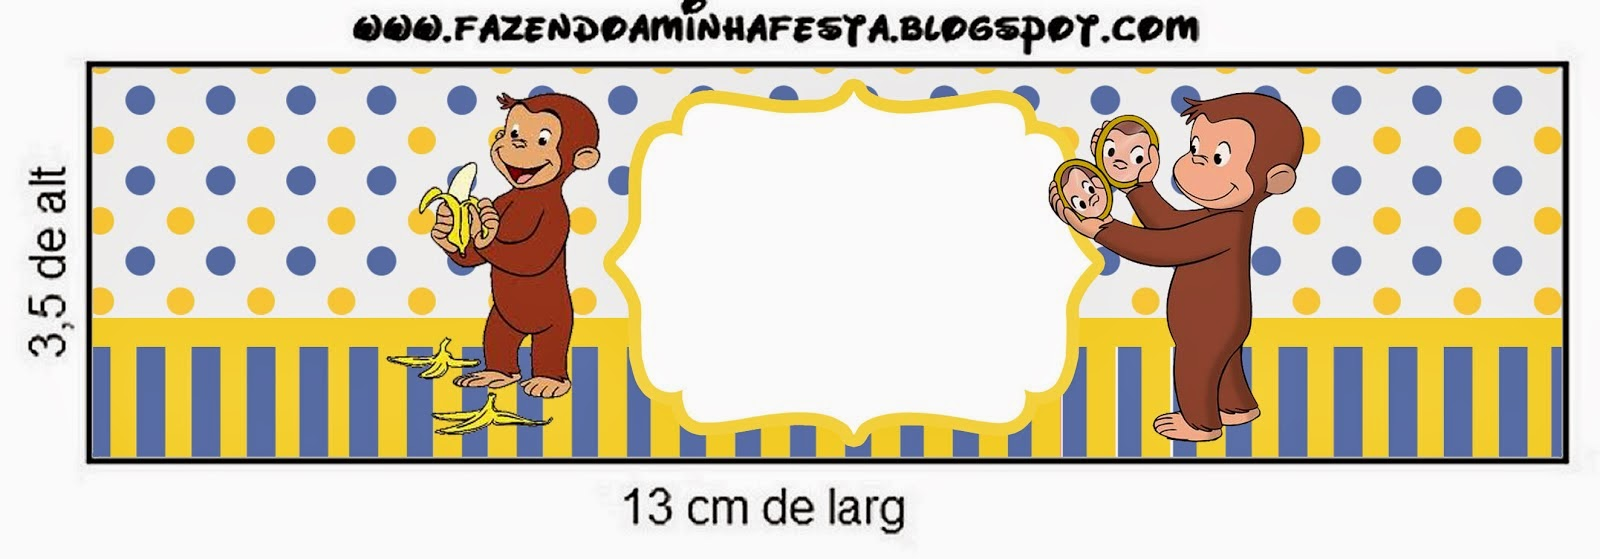 Jorge el Curioso: Etiquetas para Candy Bar Para Imprimir Gratis ...